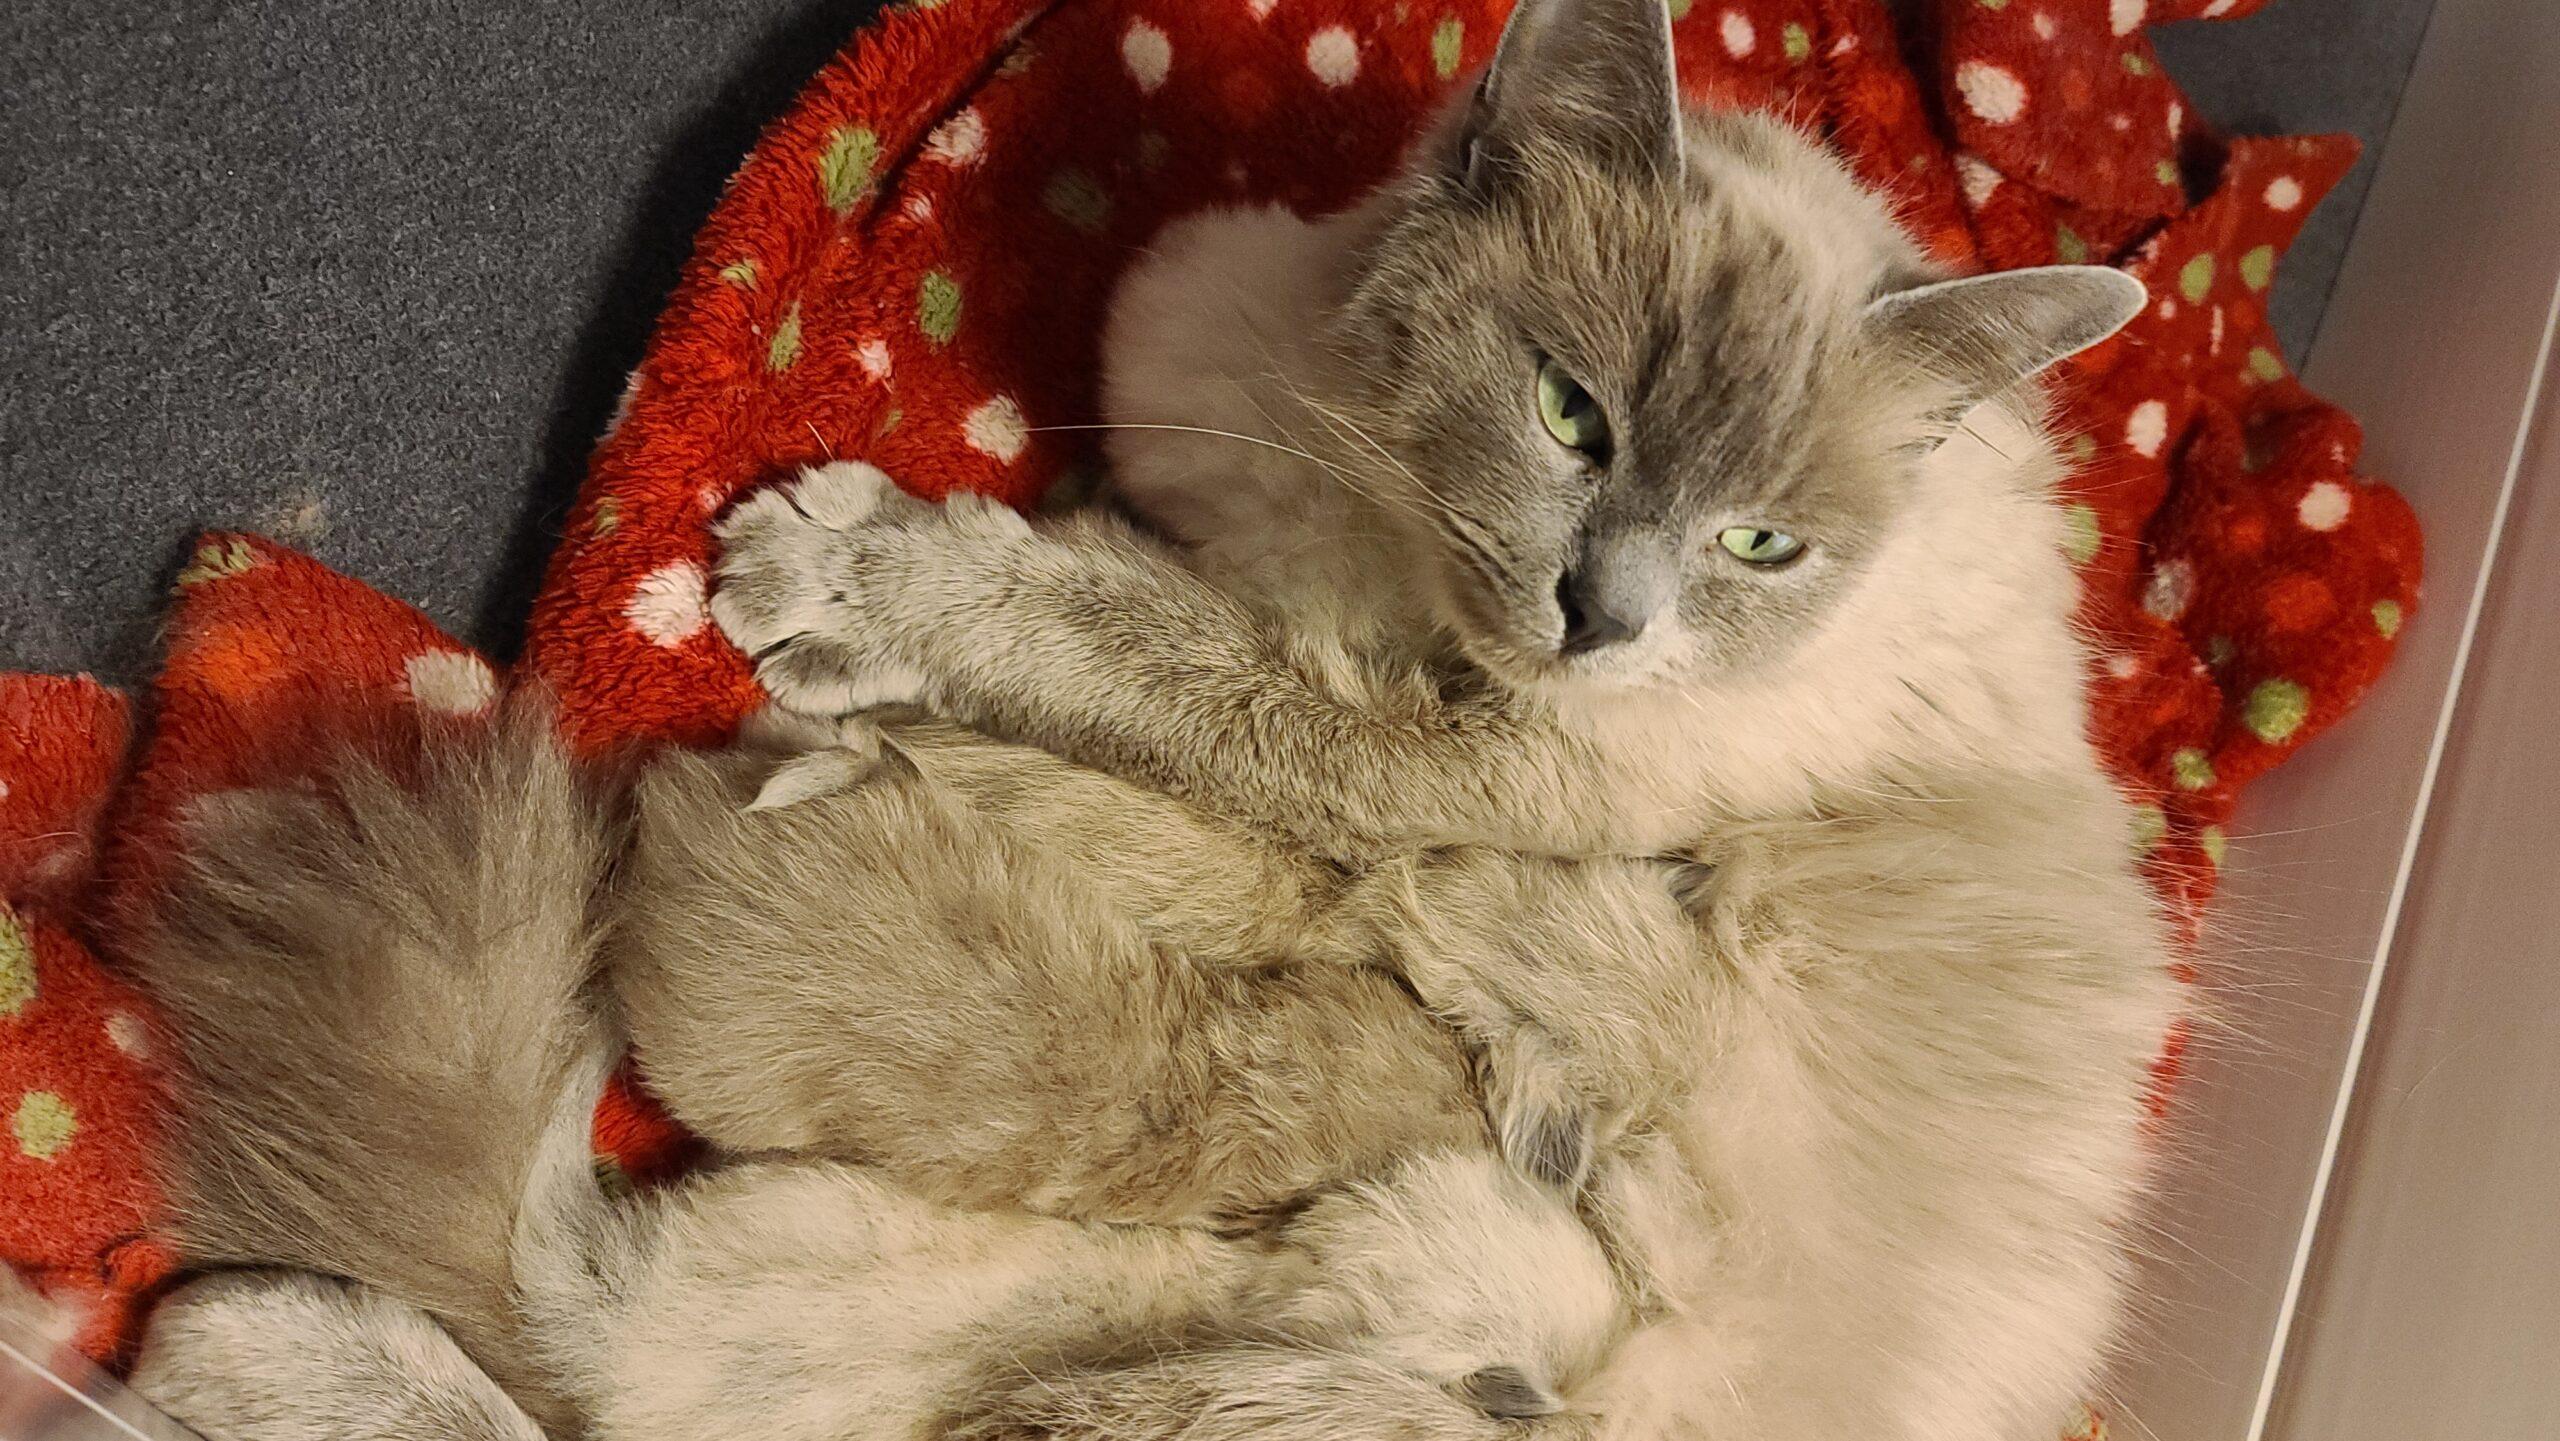 <b><h2>Izmir</h2></b><br><b>Due Date : </b>June 2021<br><b>Ready Date : </b>September 2021<br><b>Kitten Pet Price : </b>$1500 - $2500